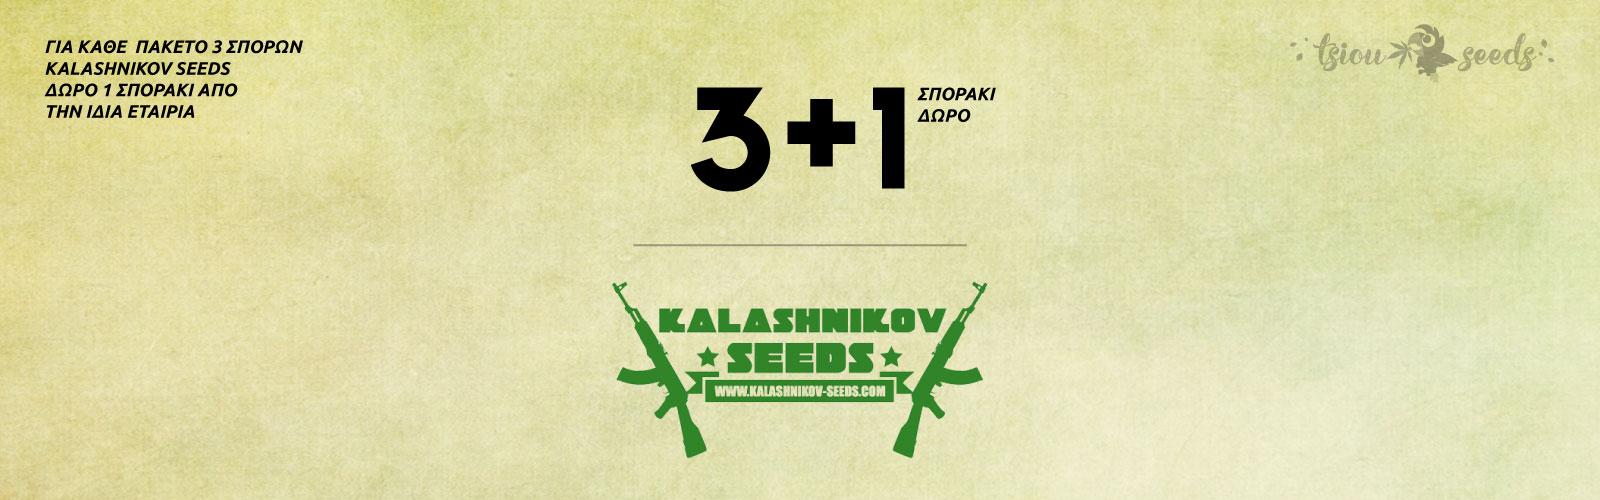 Kalashnikov-Seeds-Offer